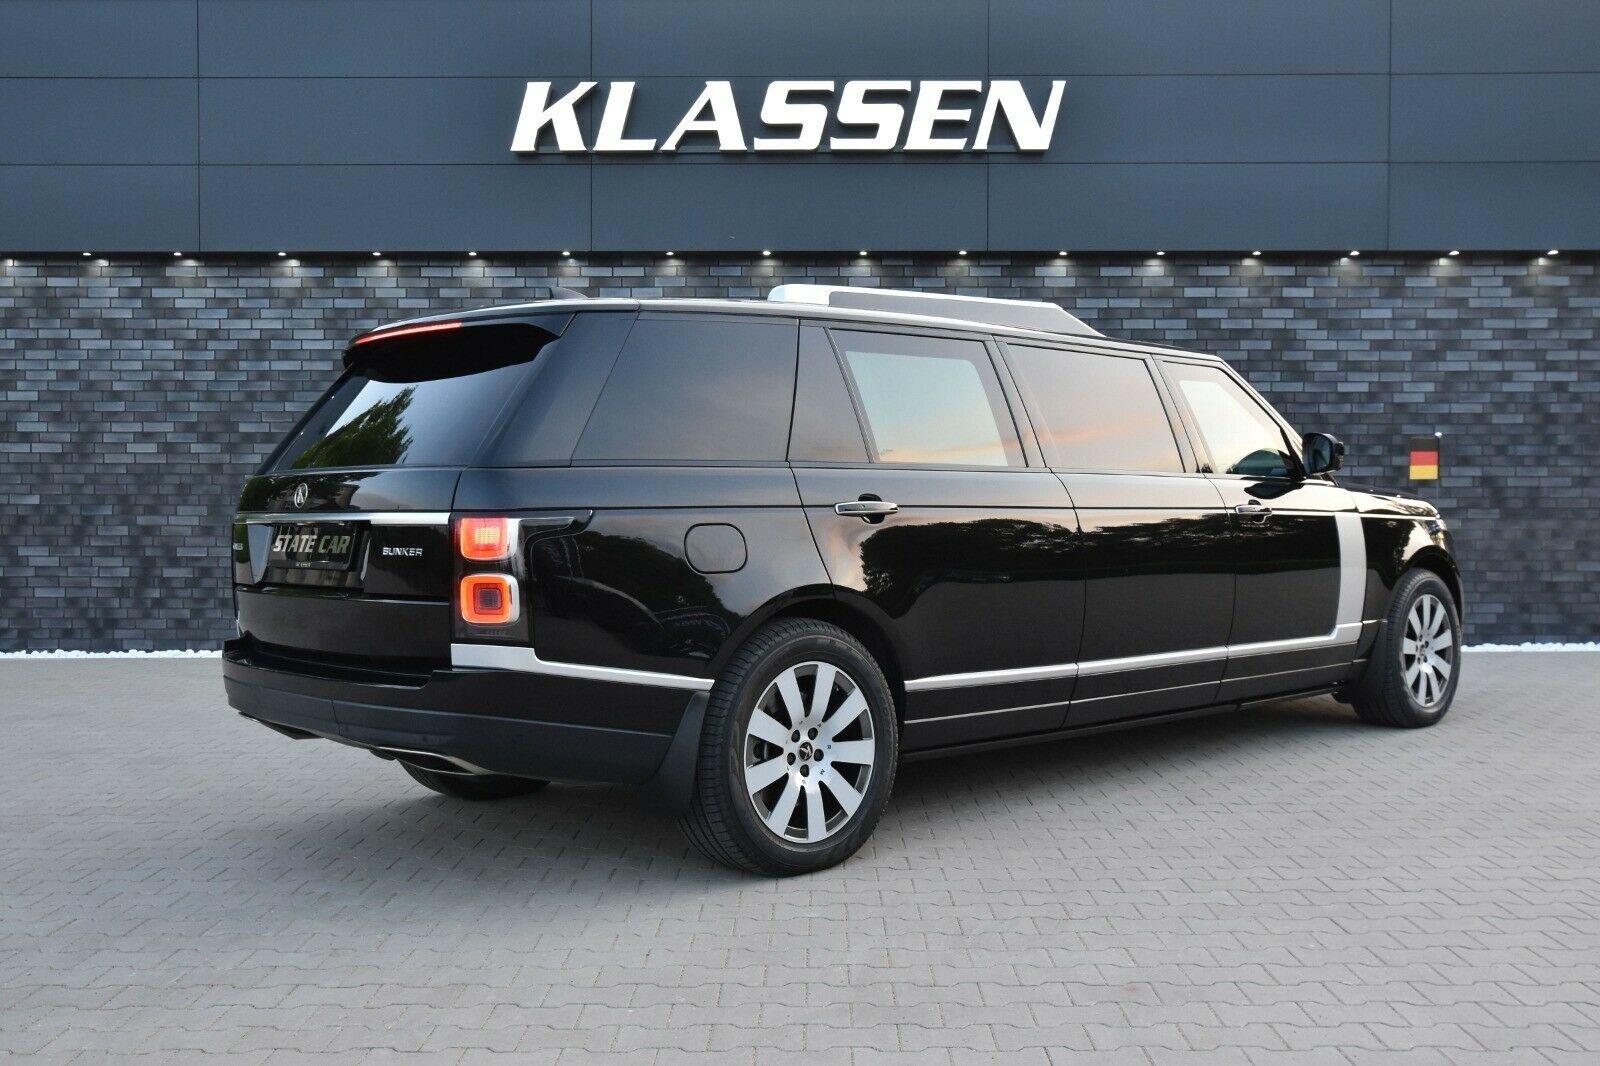 Range-Rover-SVAutobiography-by-Klassen-5